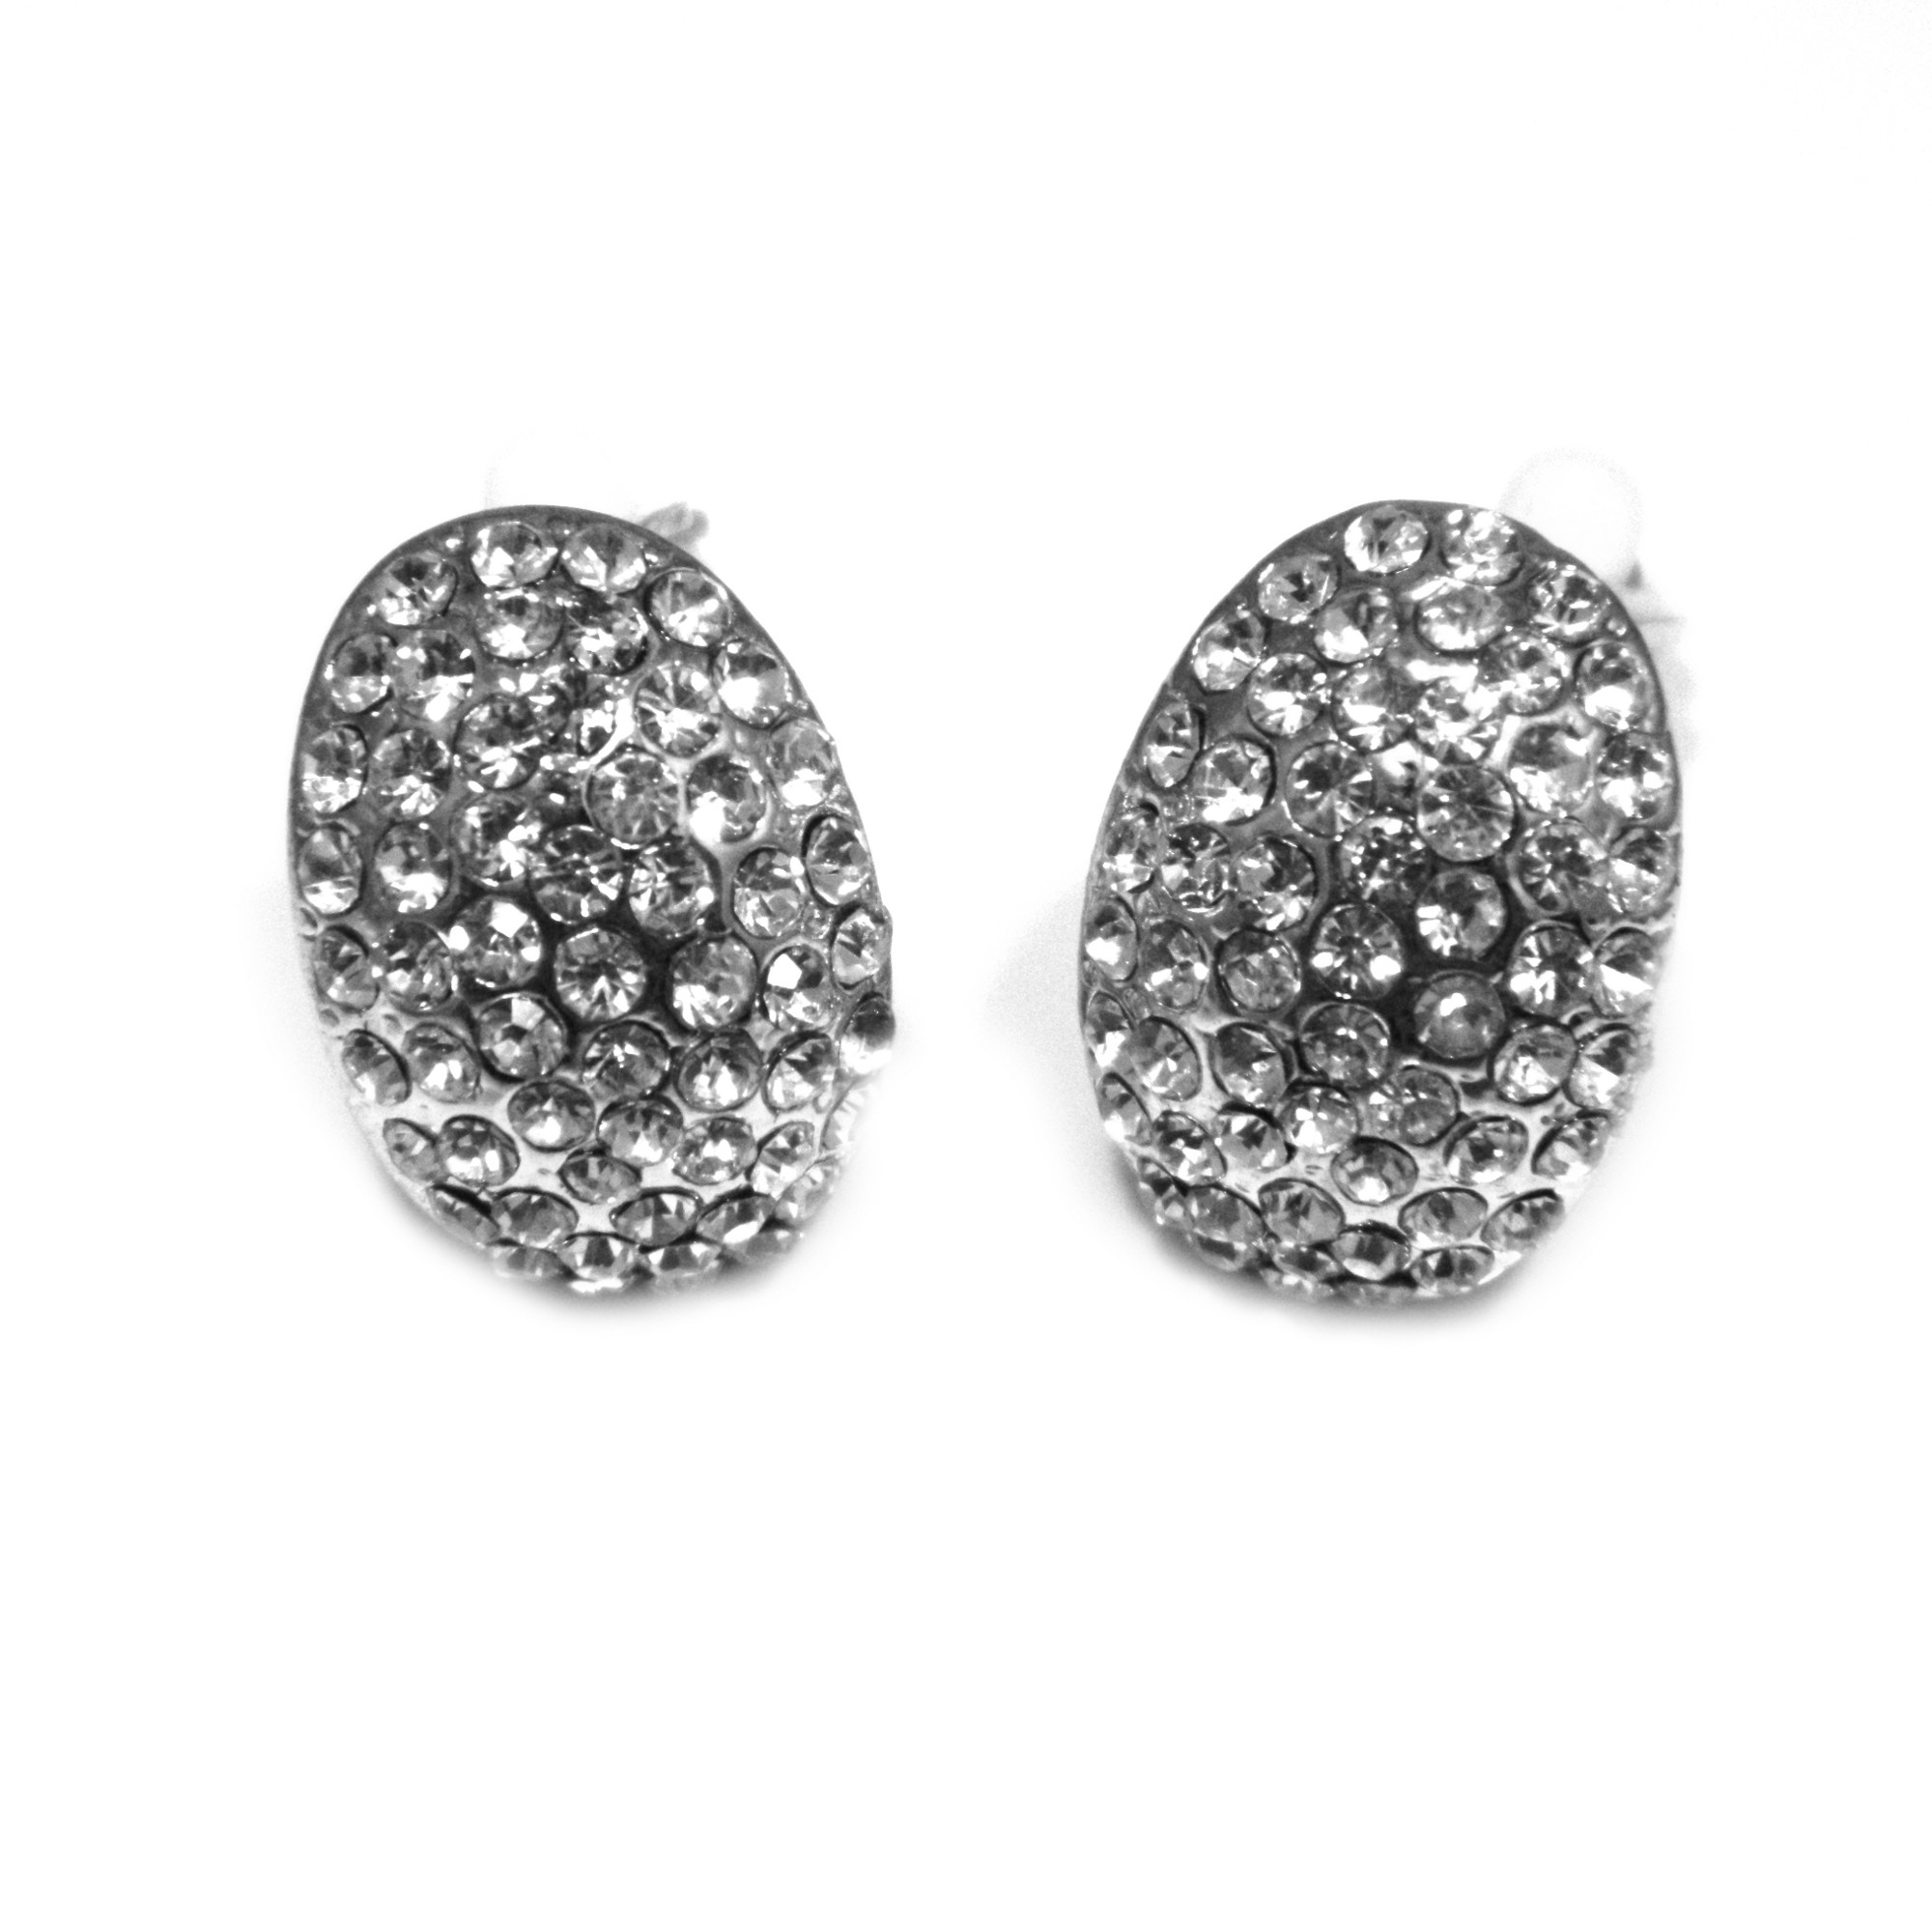 Oval crystal clip on earrings in silver plate